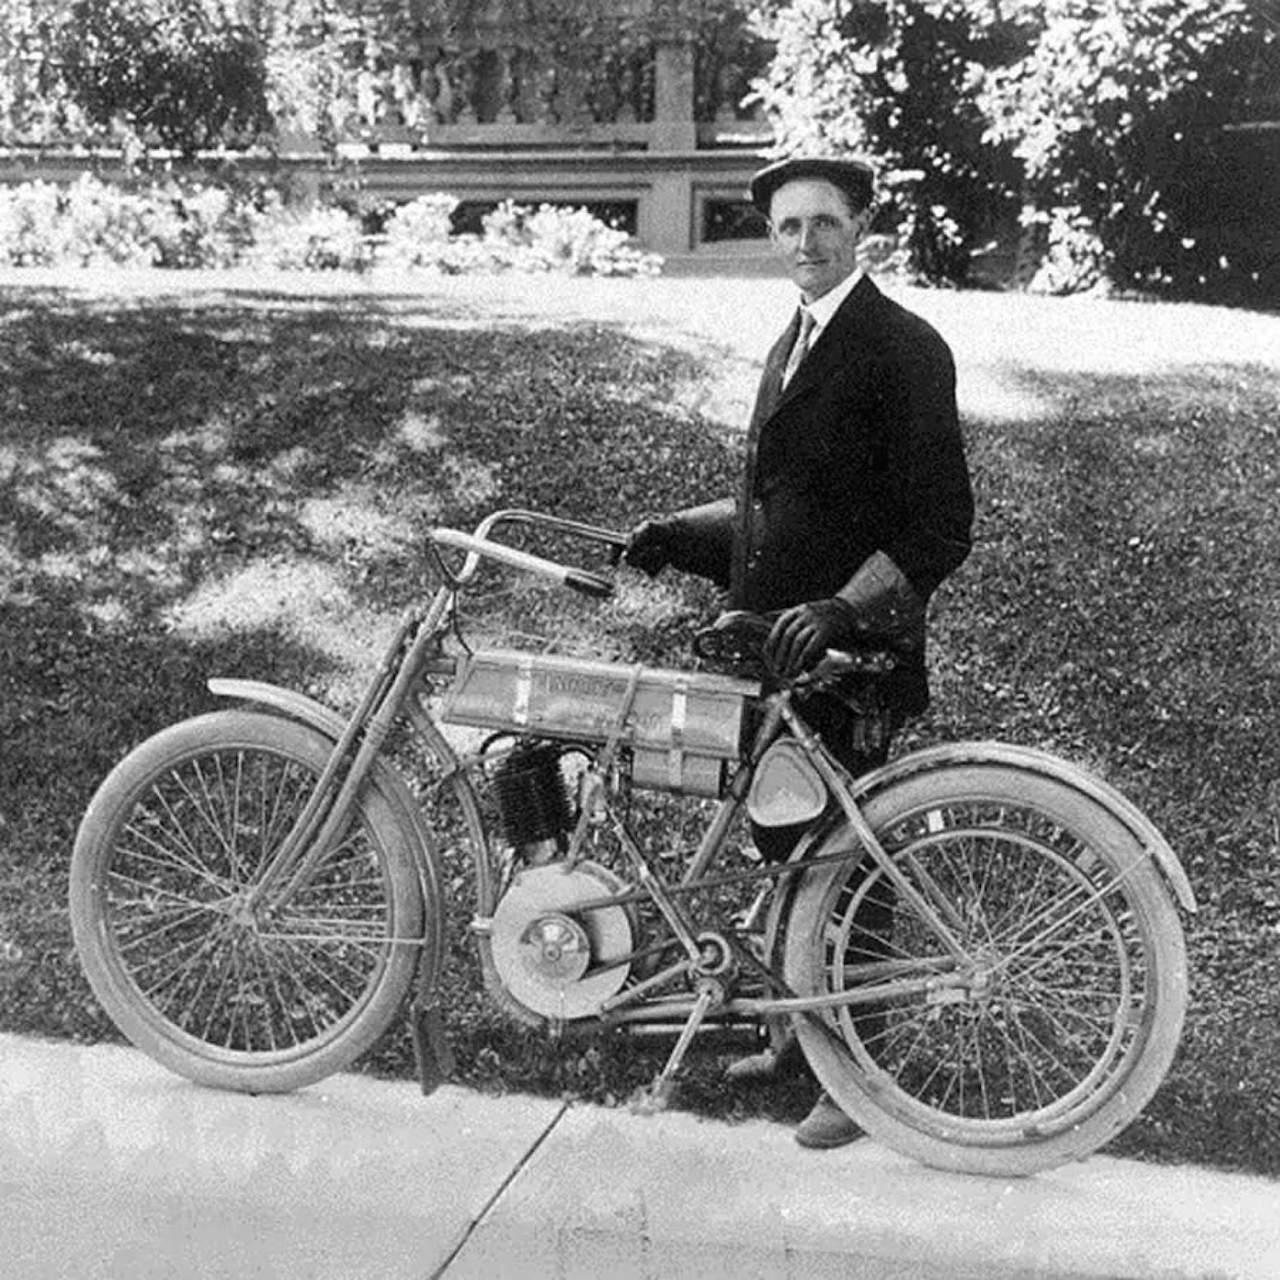 walter-davidson-harley-davidson-moto-adventure